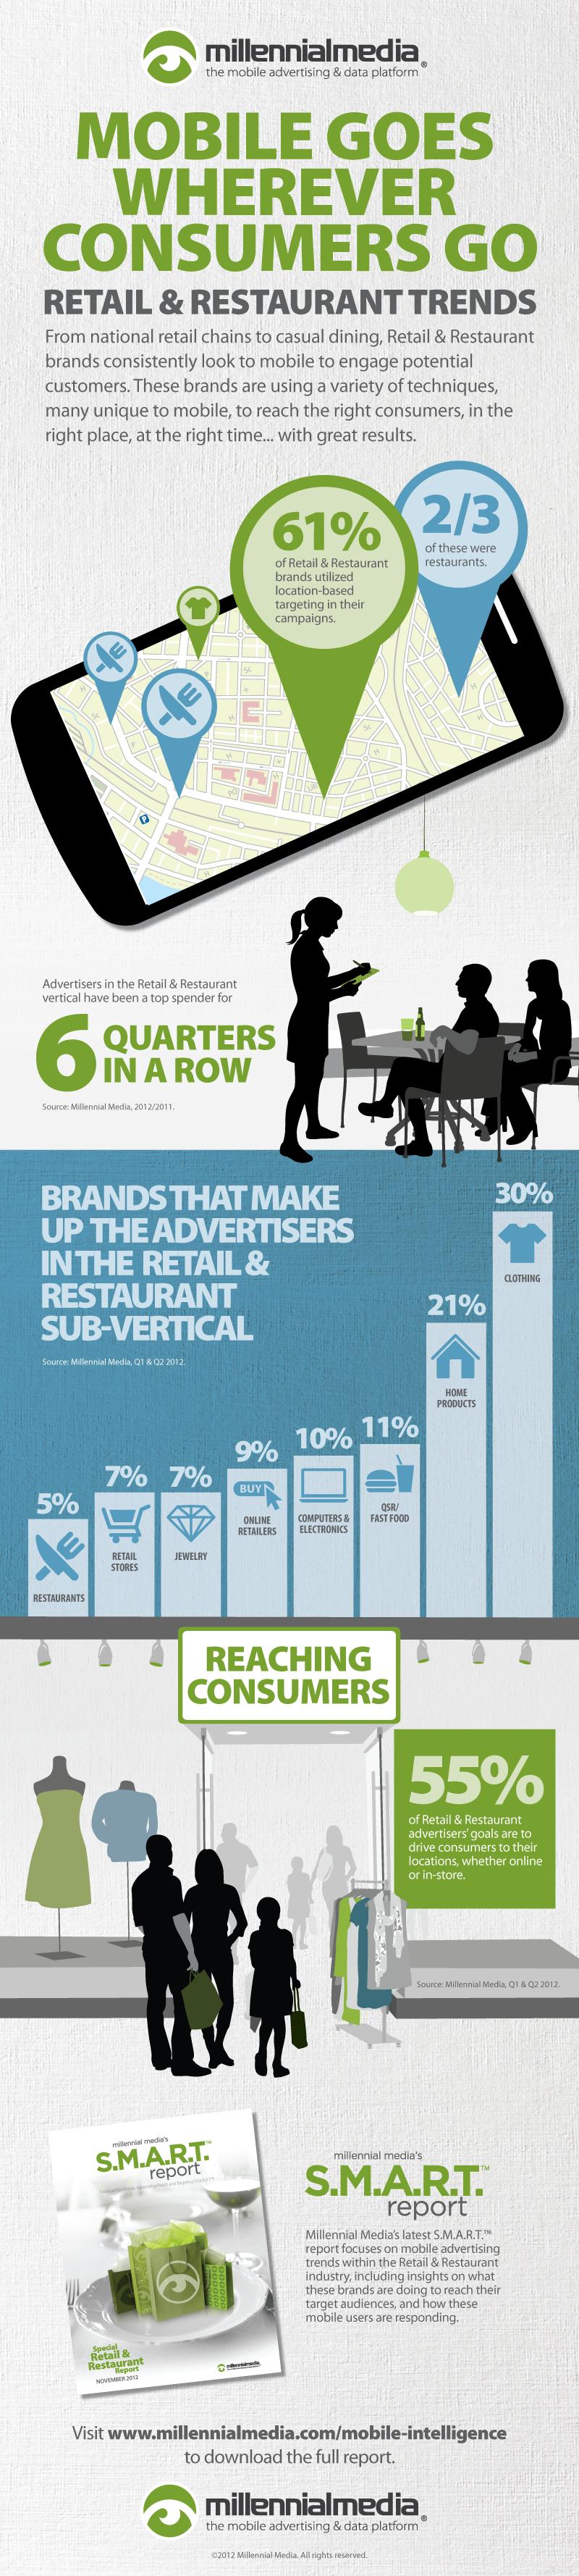 millennialmedia-smart-november-2012-infographic